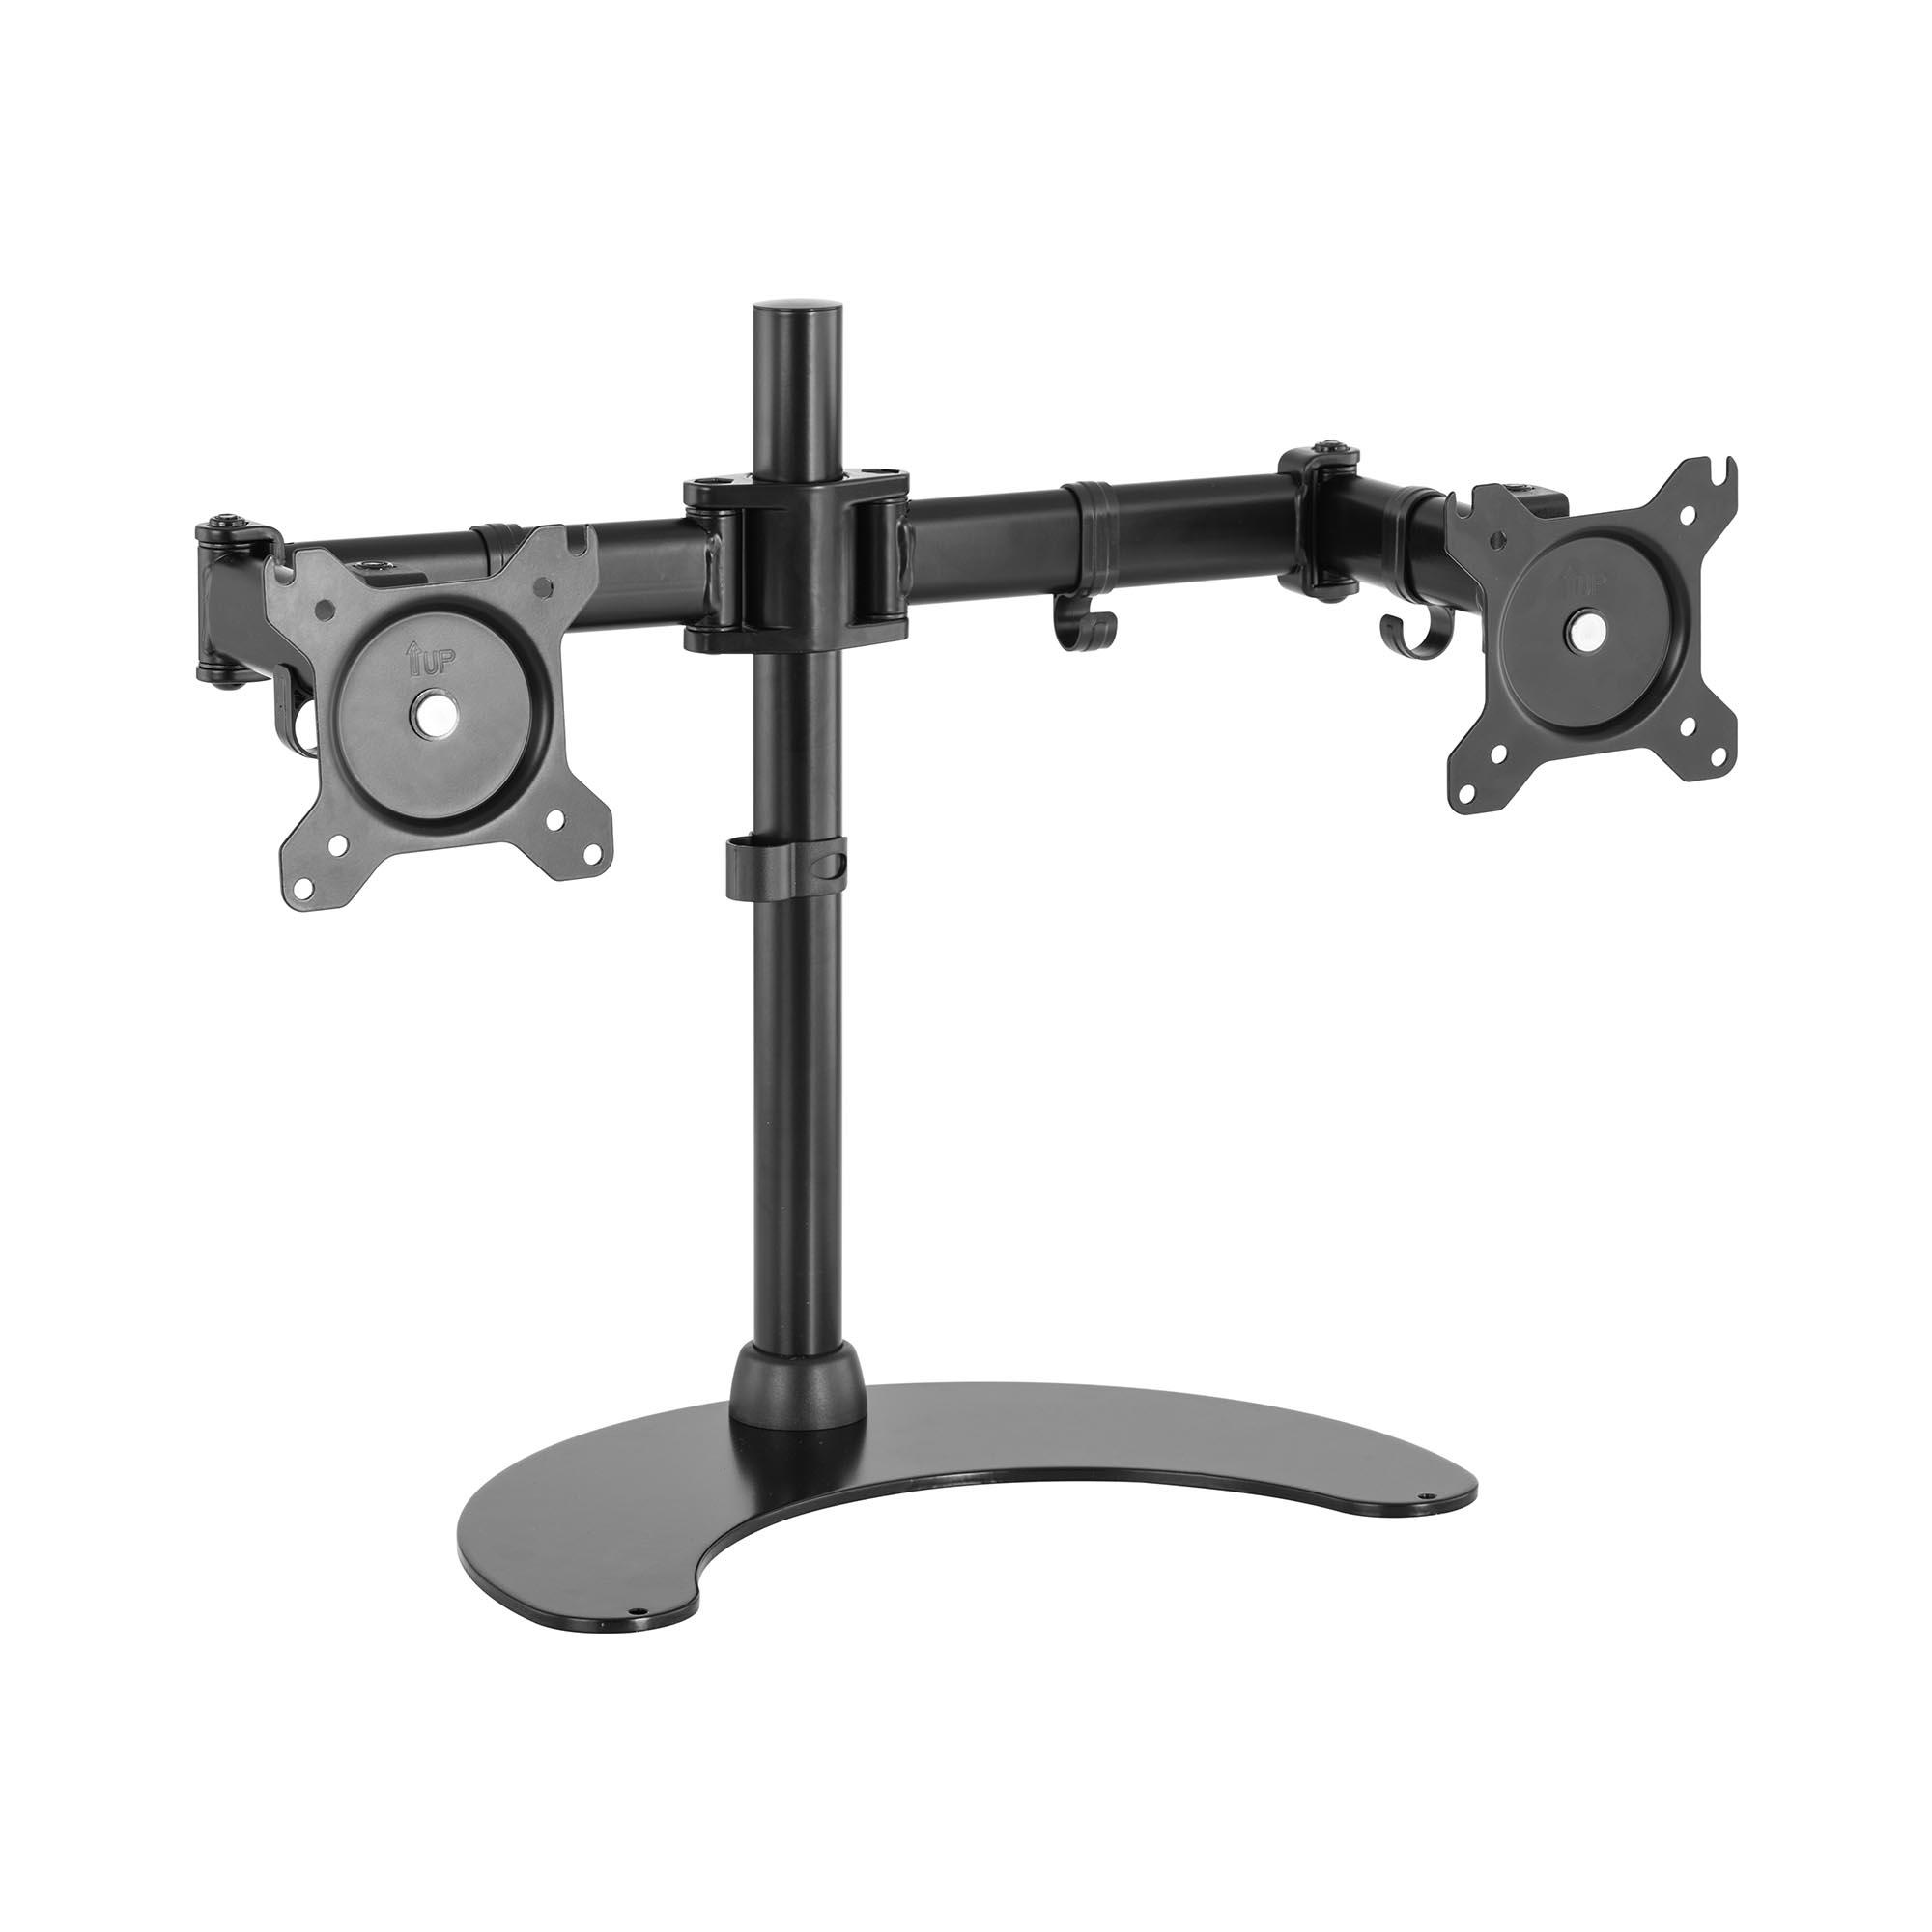 Fromm & Starck Monitorhalterung - 2 Monitore - Standfuß - 13